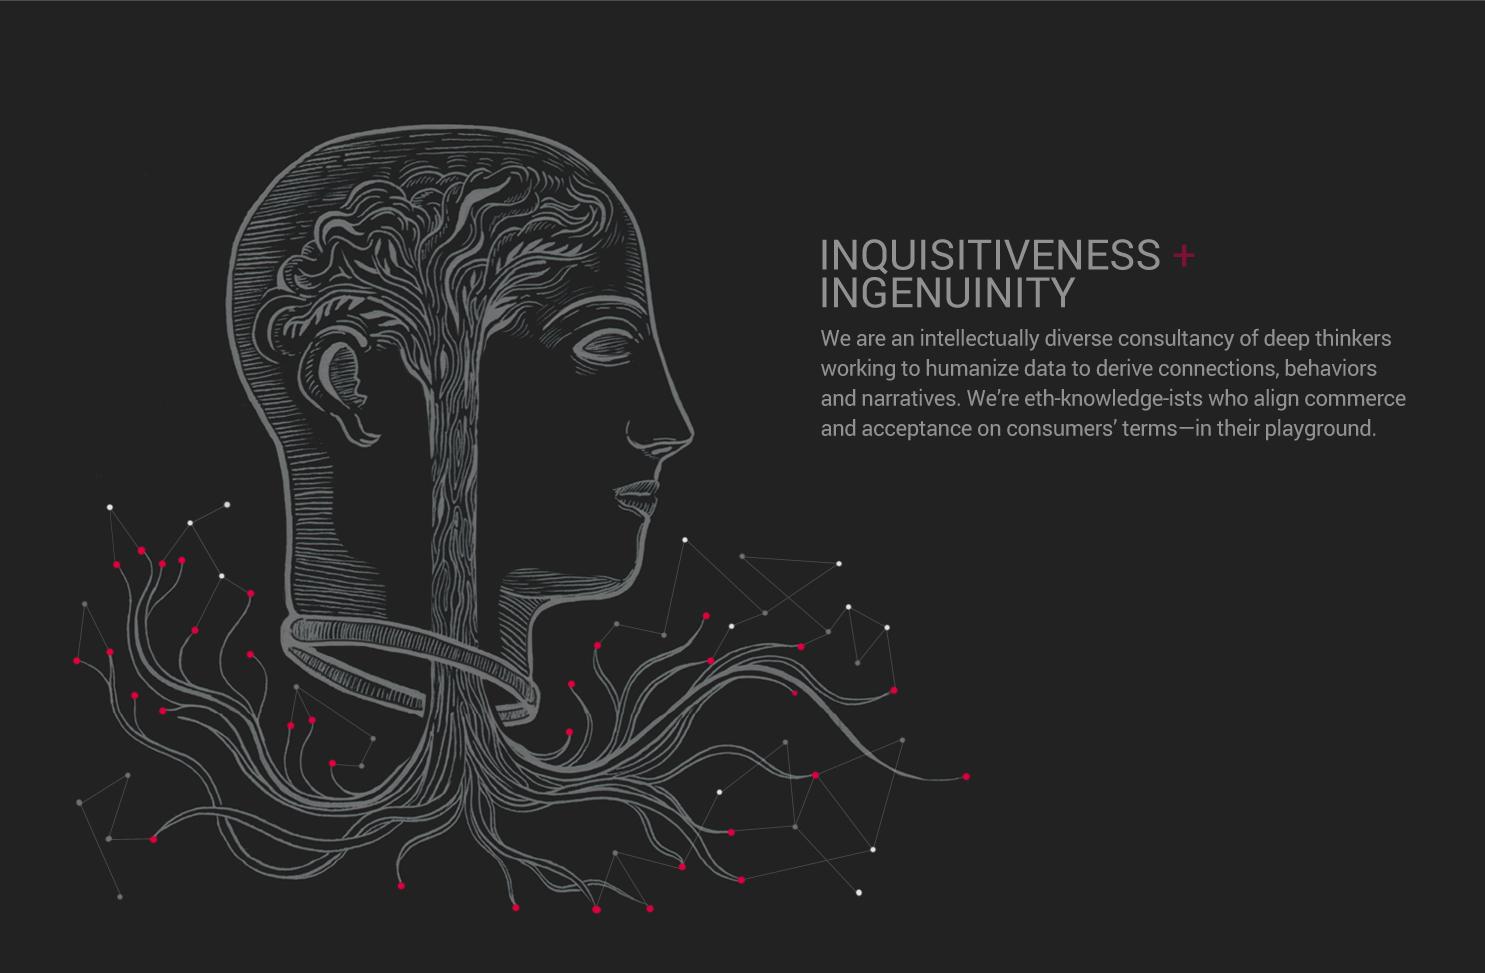 1_Inquisitiveness_head_profile.jpg